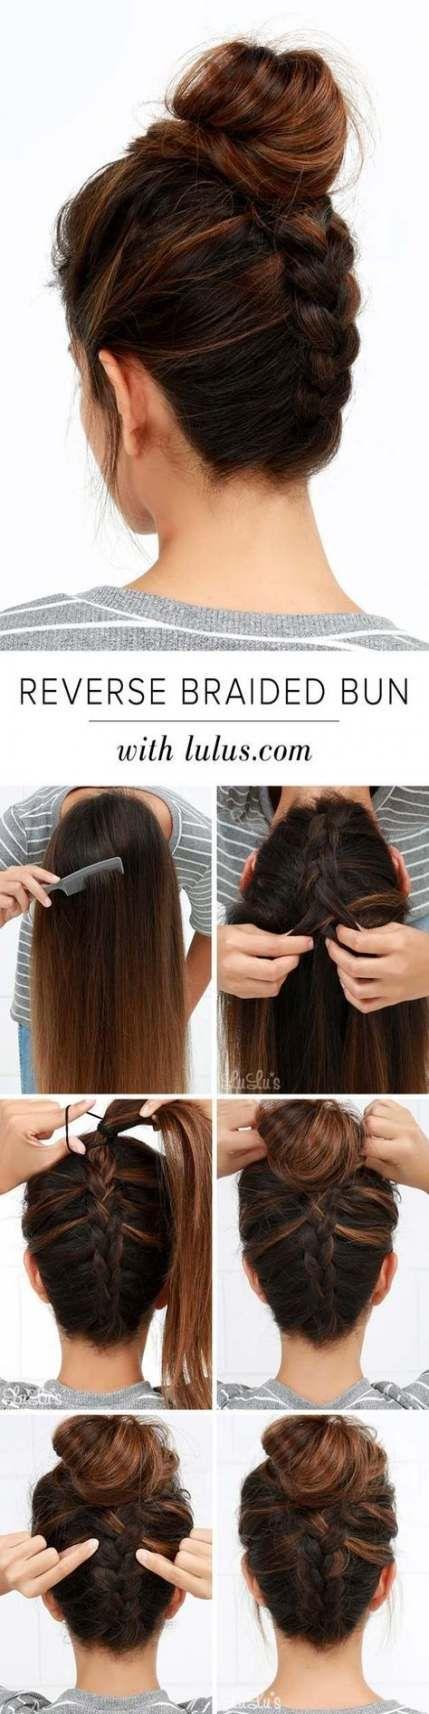 16+ Ideas nails design for teens long hair   Diy ...